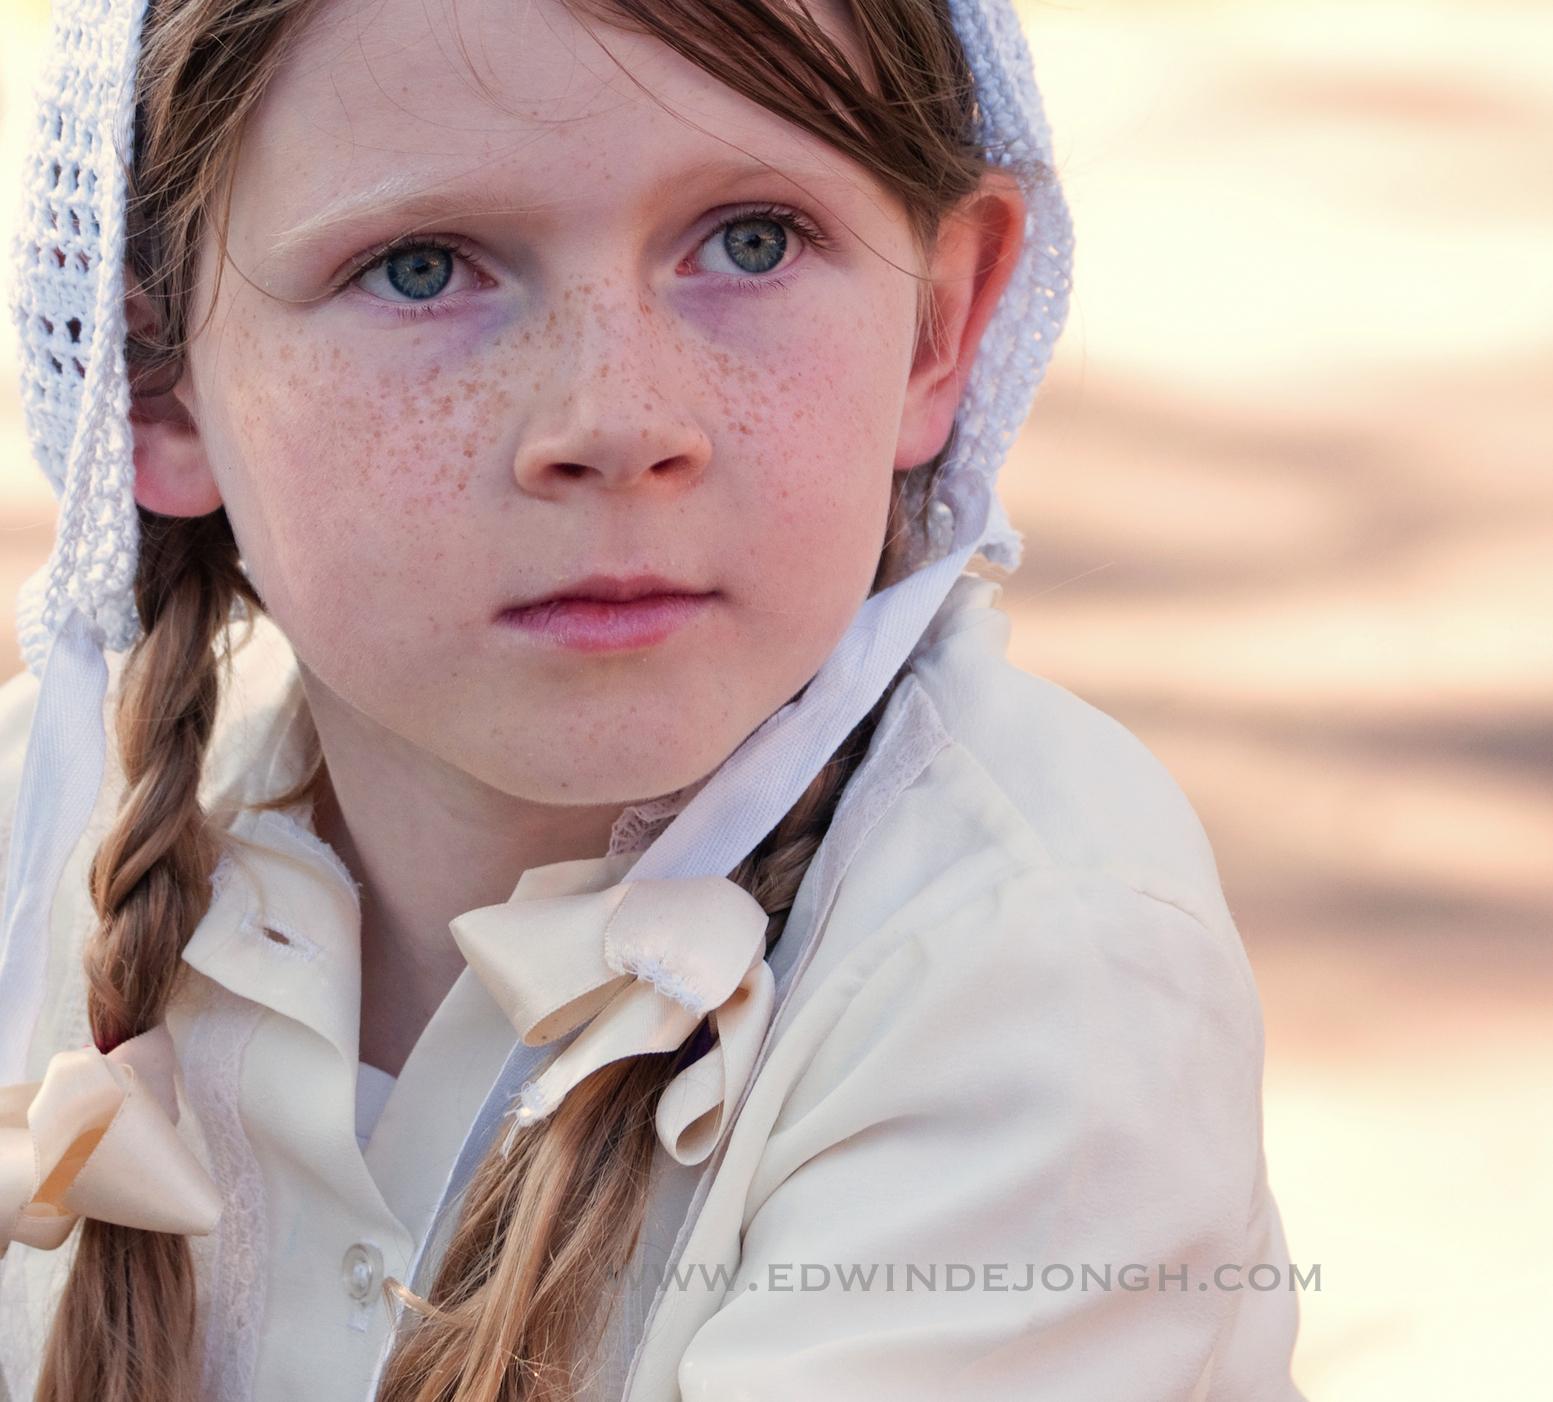 Ameland girl